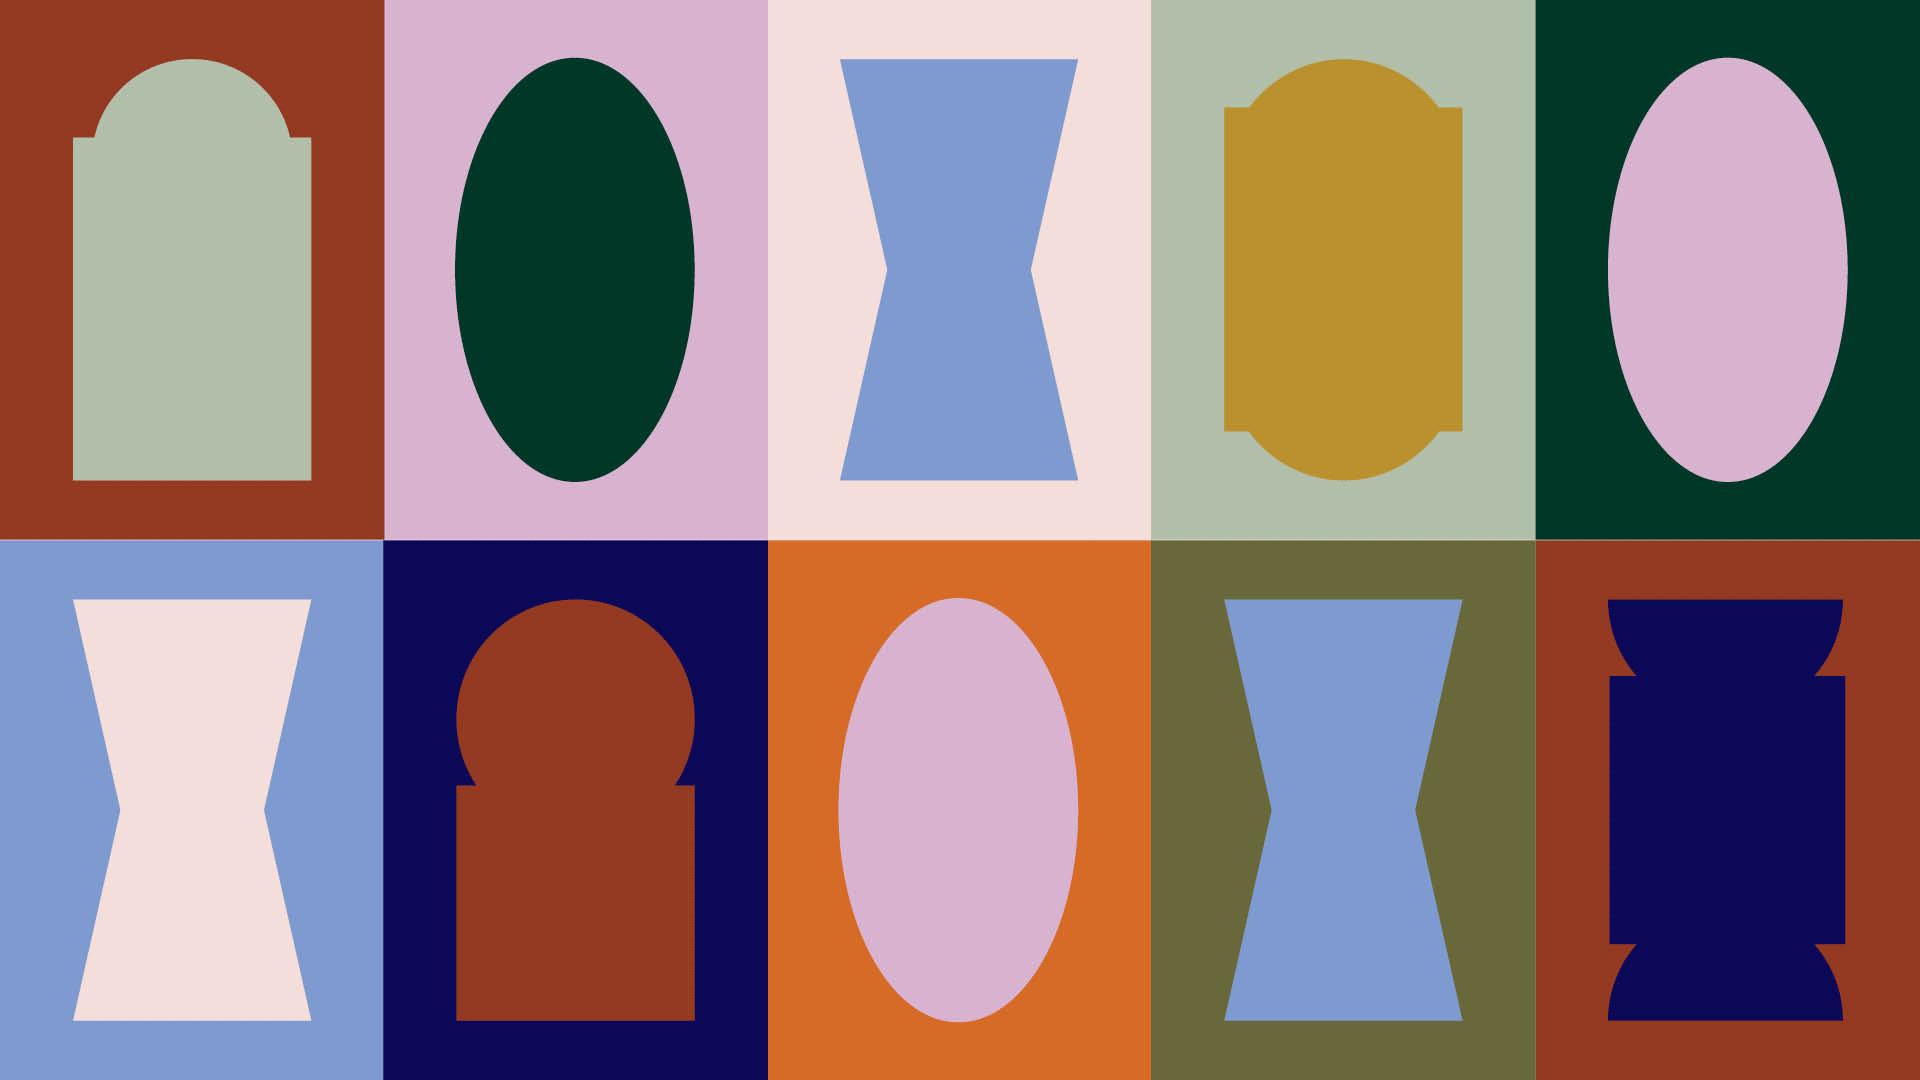 New Logo and Identity for Moda Operandi by Lotta Nieminen